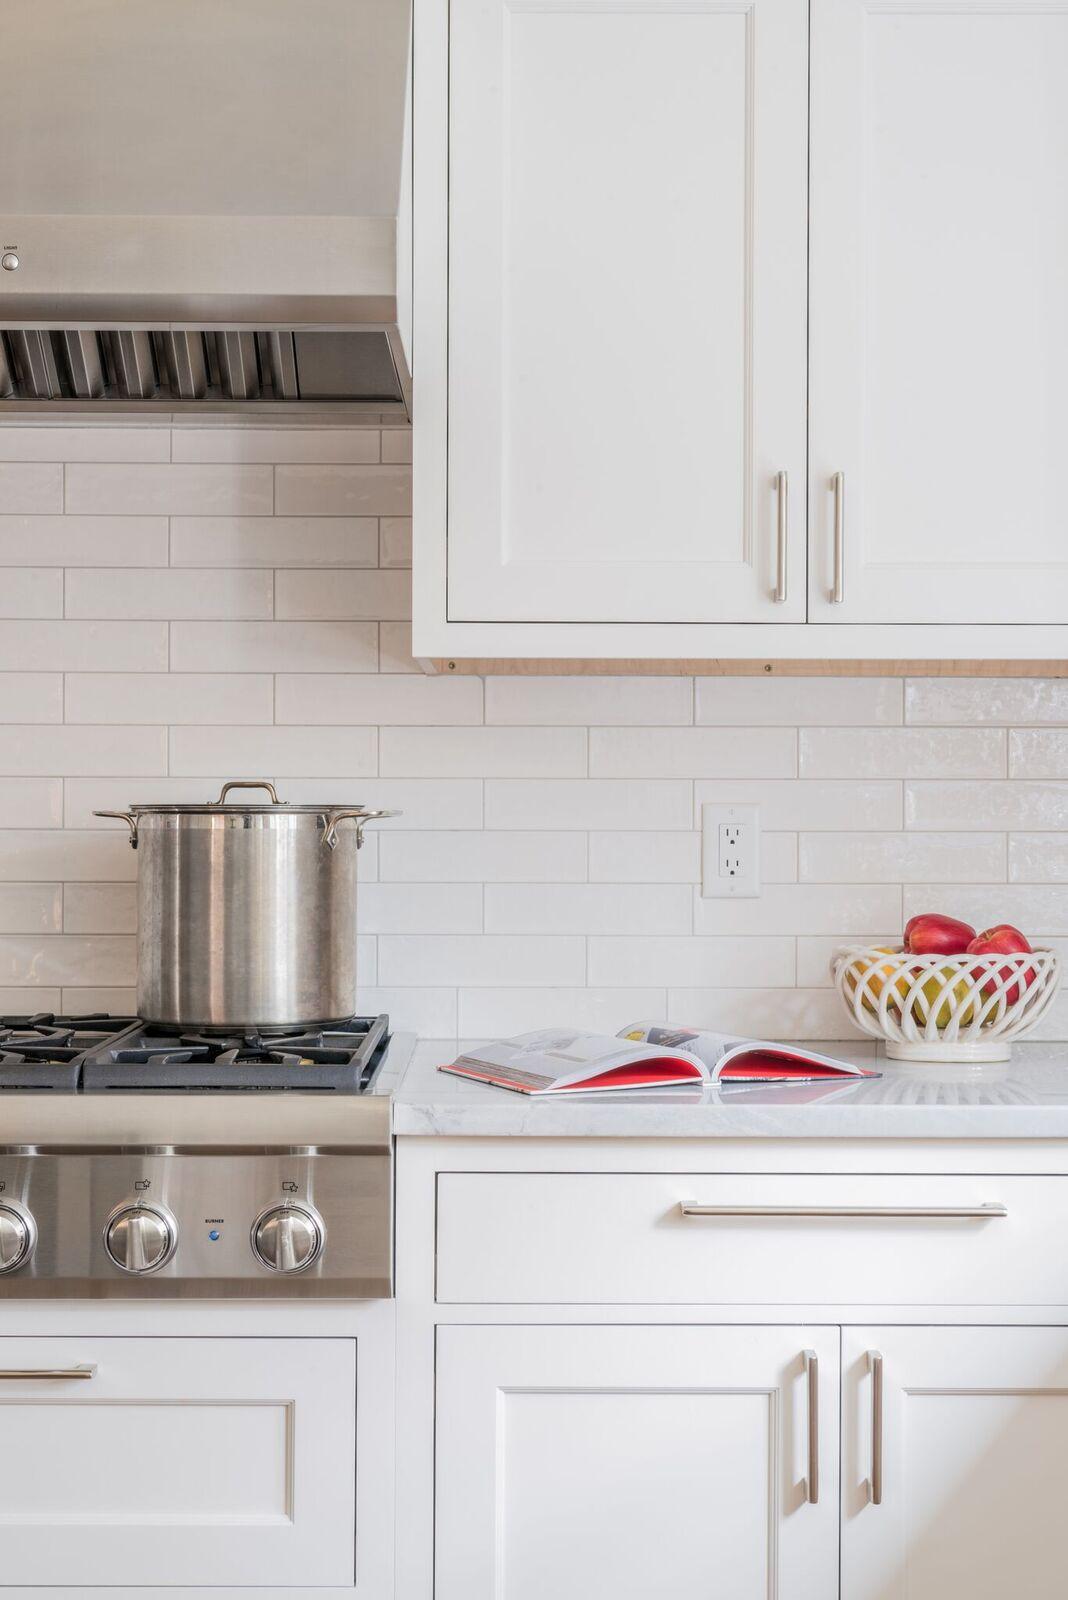 Pic 9 pot on stove.jpg